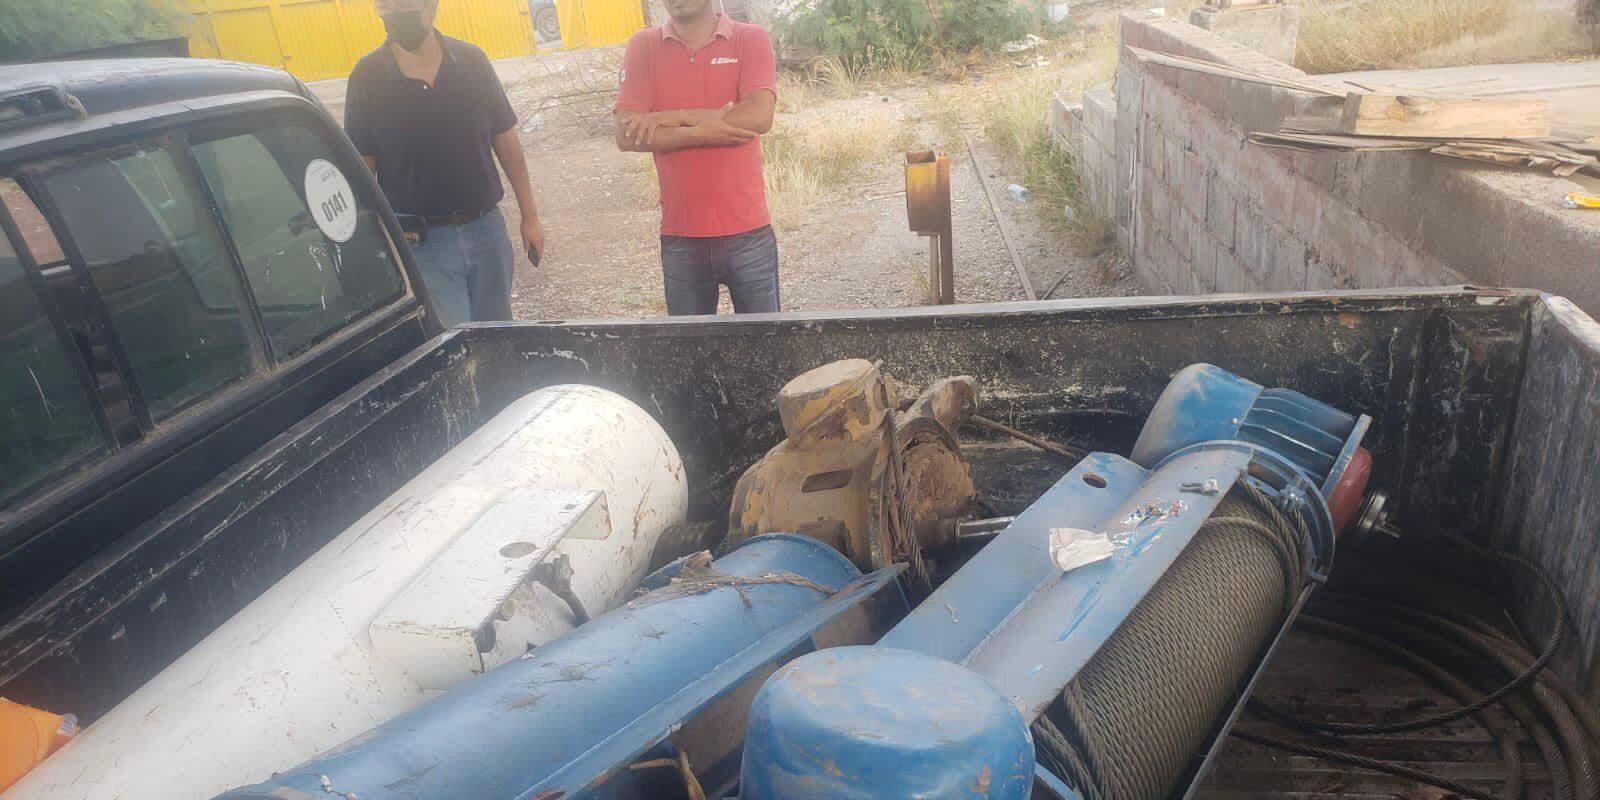 Policía Municipal de Monclova evita robo en taller, pero se les escapan los ladrones